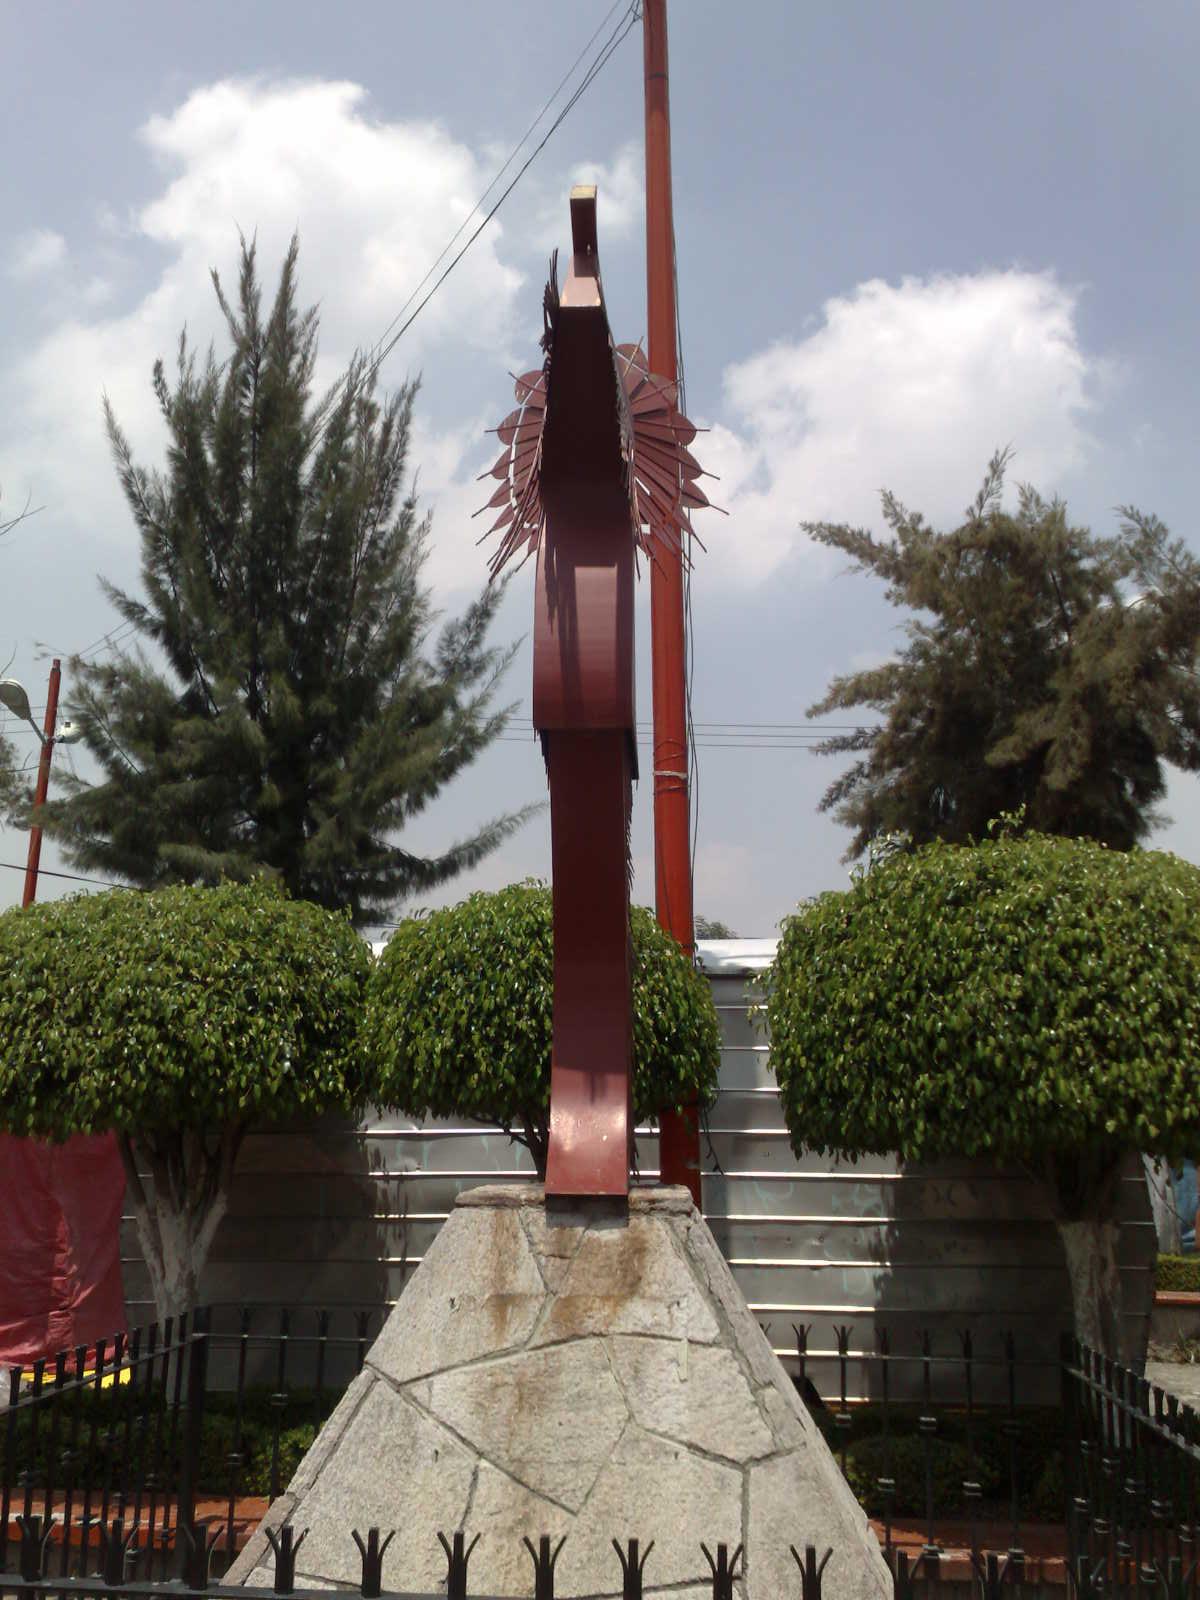 Apache in Plaza Wichita, San Bartolo Tenayuca, Tlalnepantla